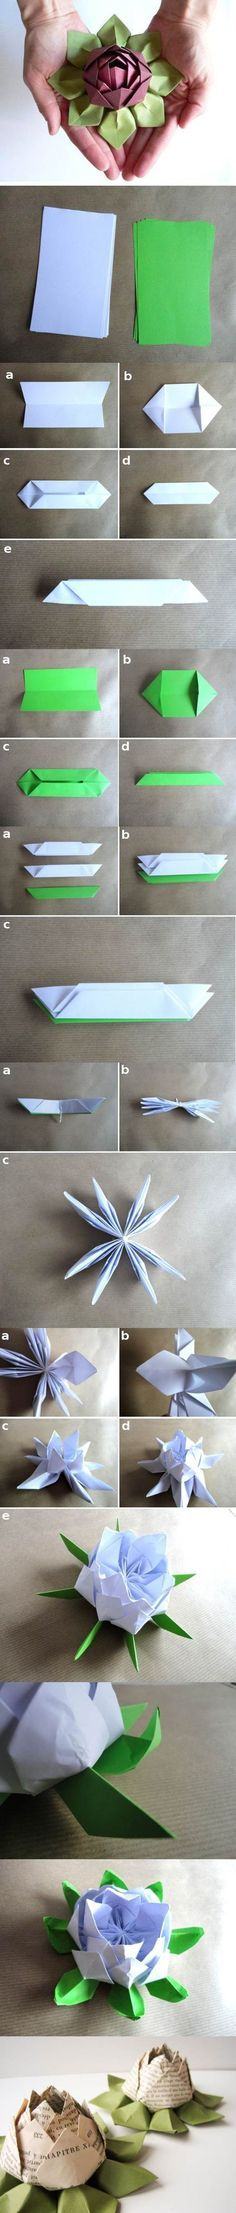 DIY Origami Lotus Flower | iCreativeIdeas.com Like Us on Facebook ==> https://www.facebook.com/icreativeideas: